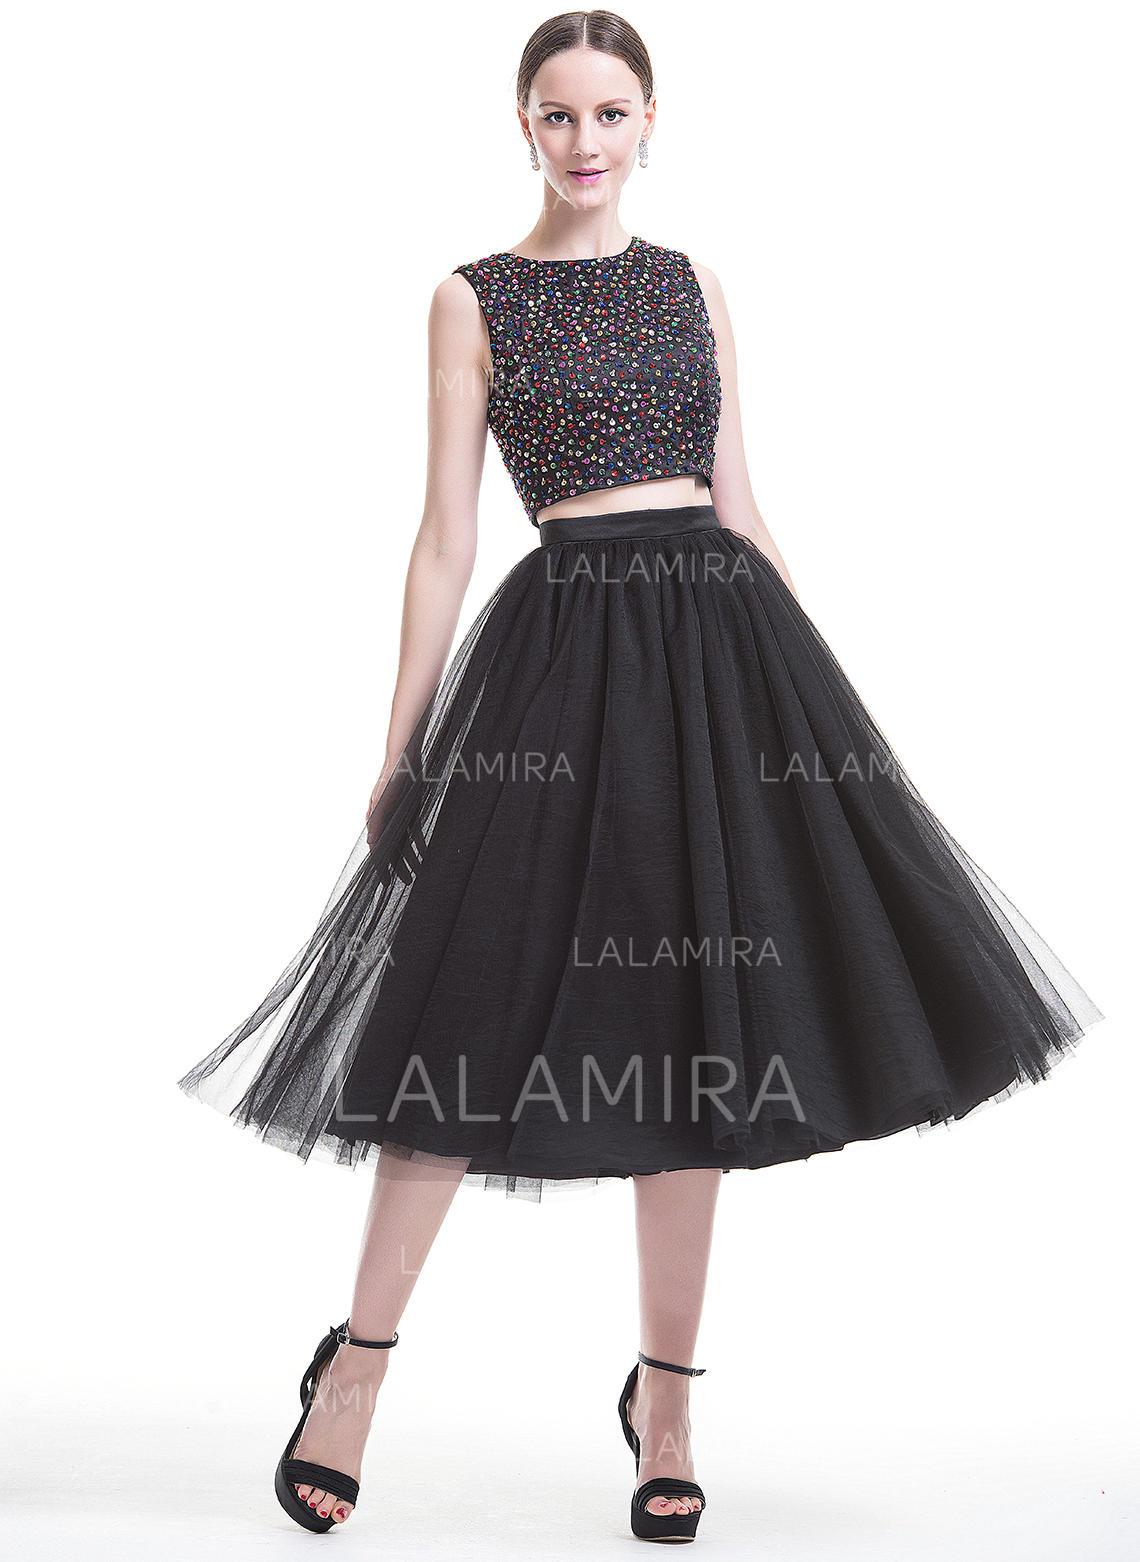 3f1f76b381a A-Line Princess Tea-Length Homecoming Dresses Scoop Neck Satin Tulle  Sleeveless (. Loading zoom